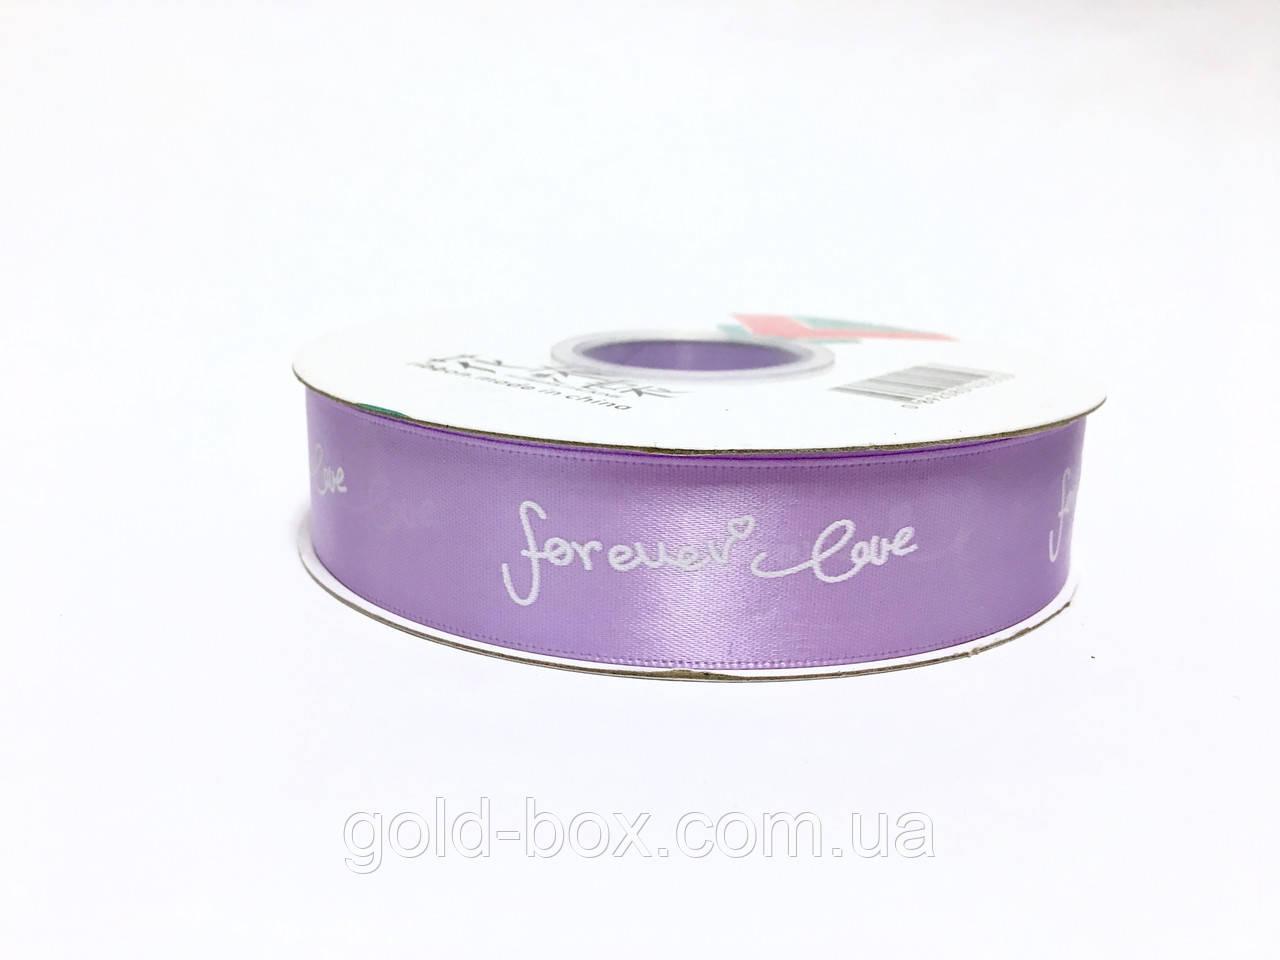 Лента для декора «Forever Love»2,5см/45-46м цвет тёмно-серый лиловый